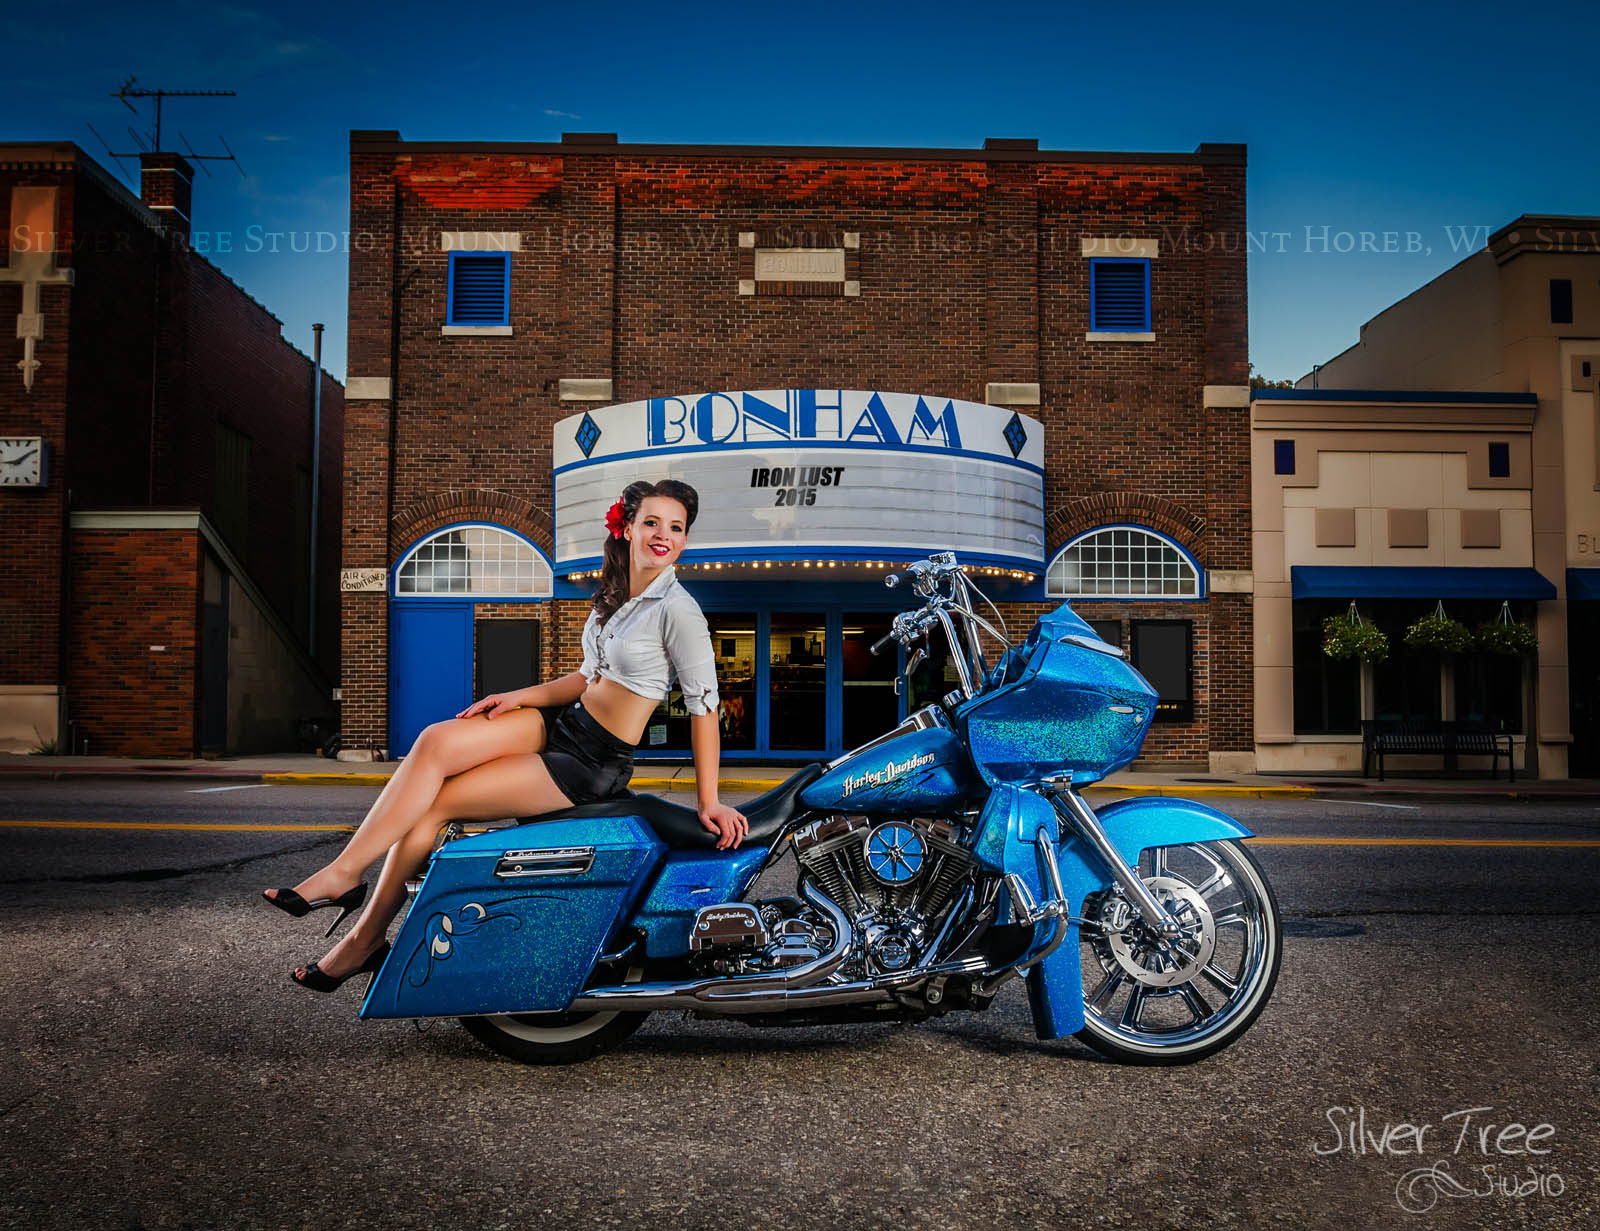 Commissioned by Sauk Prairie Harley Davidson